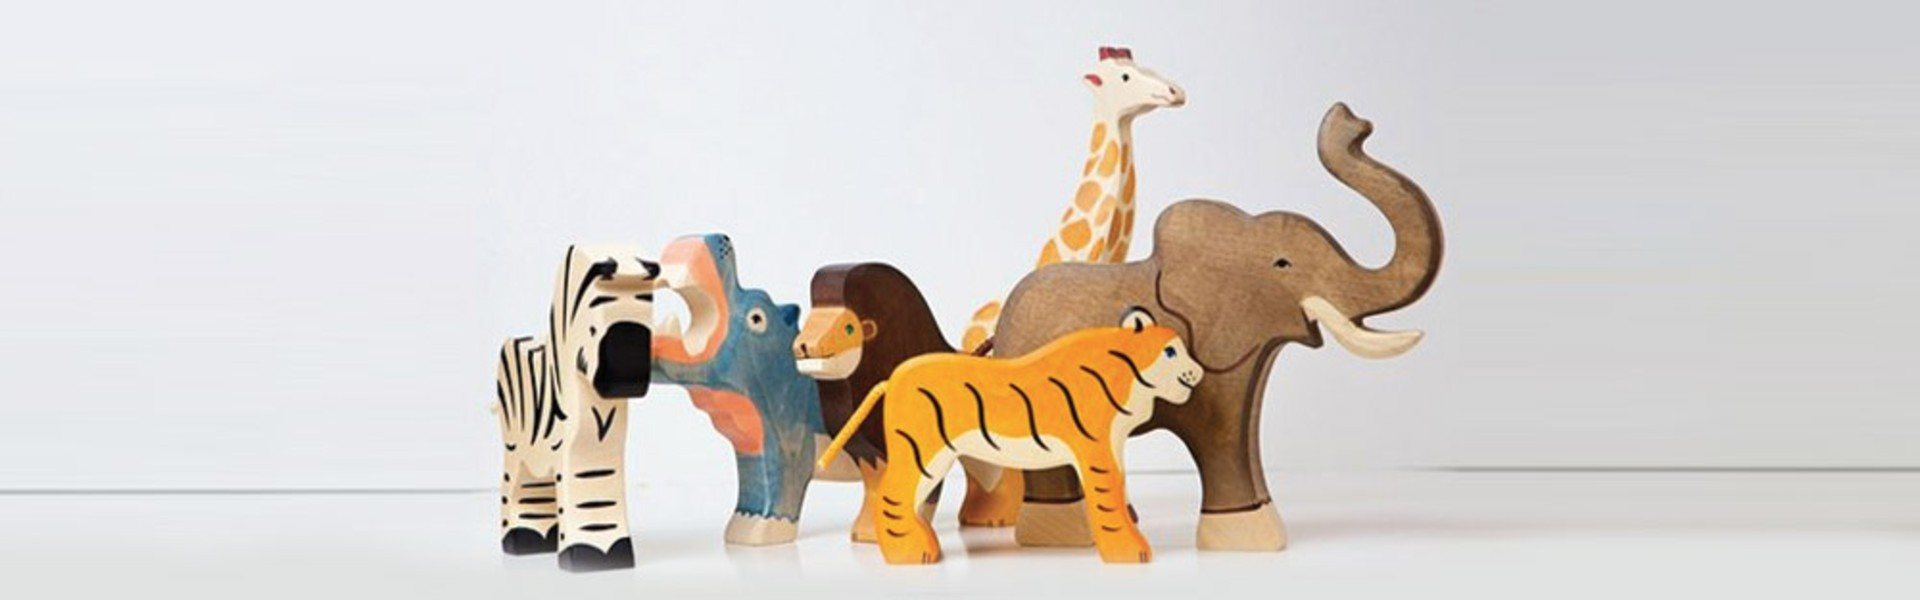 German Handmade Wood Toys